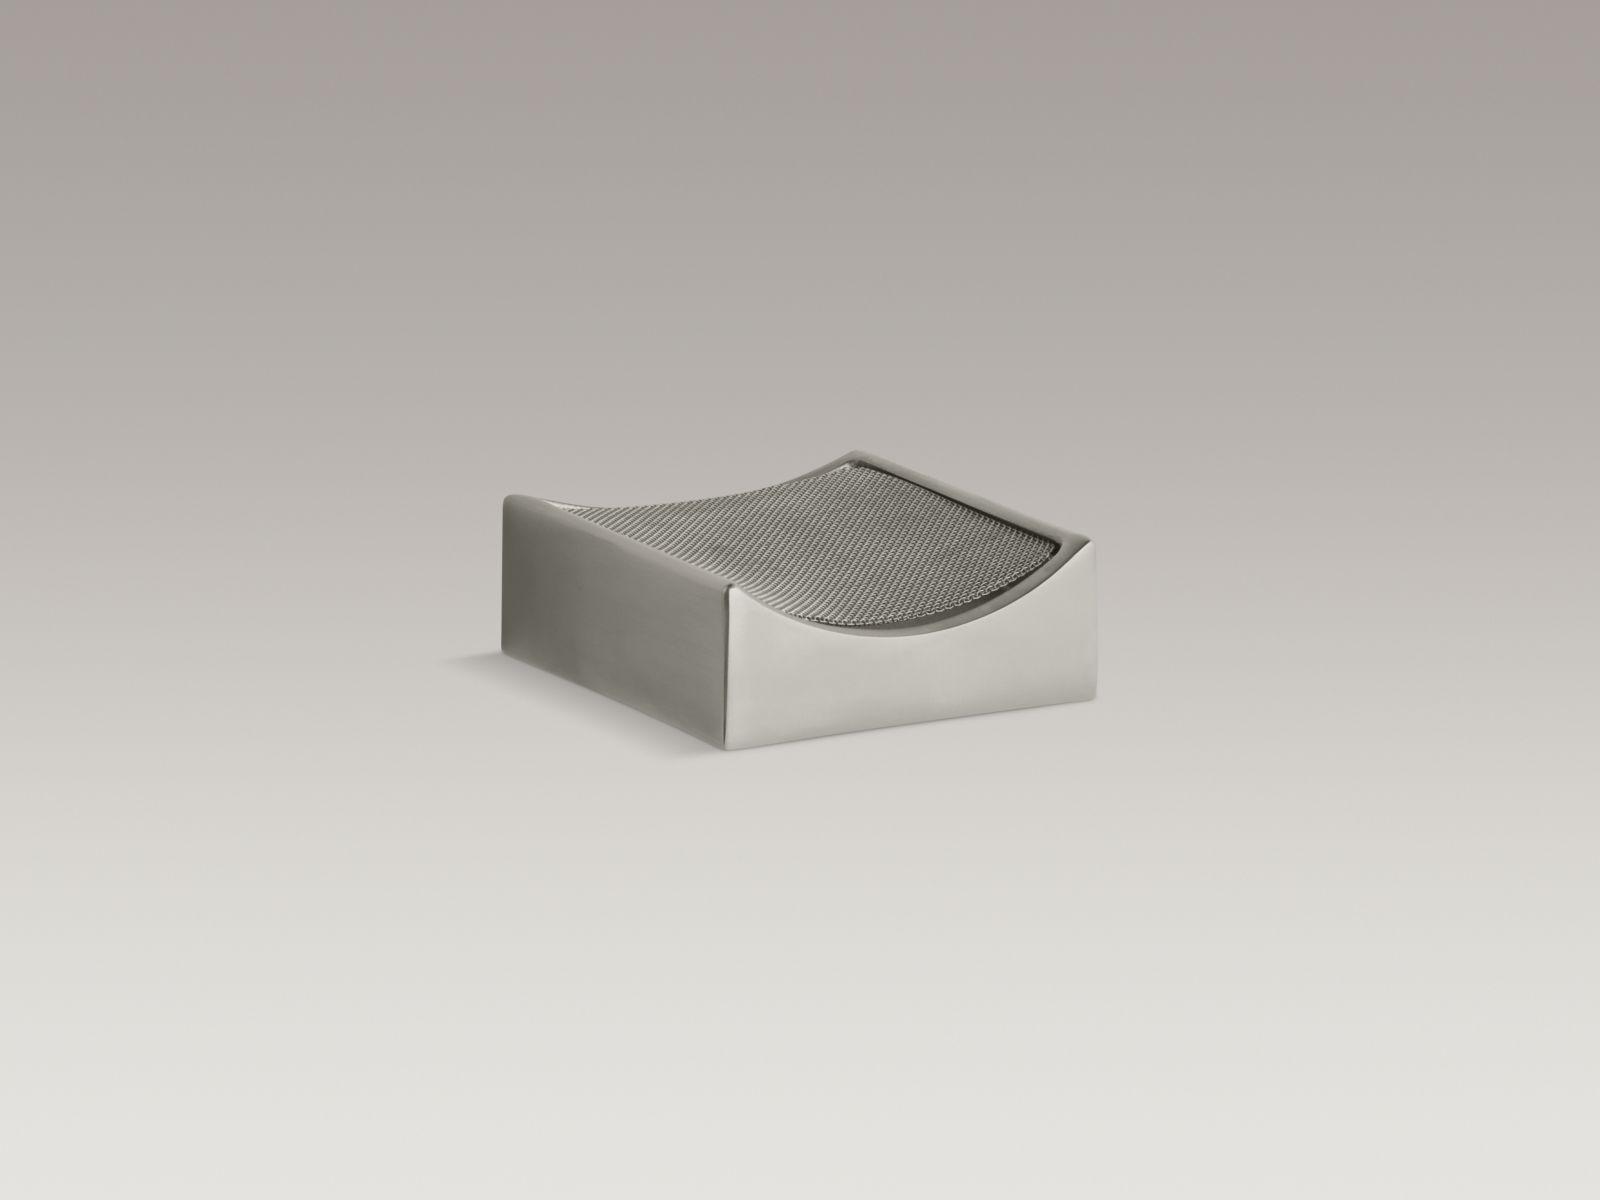 Kohler K-924-BN Stillness Optional Drip Tray with Removable Screen Vibrant Brushed Nickel